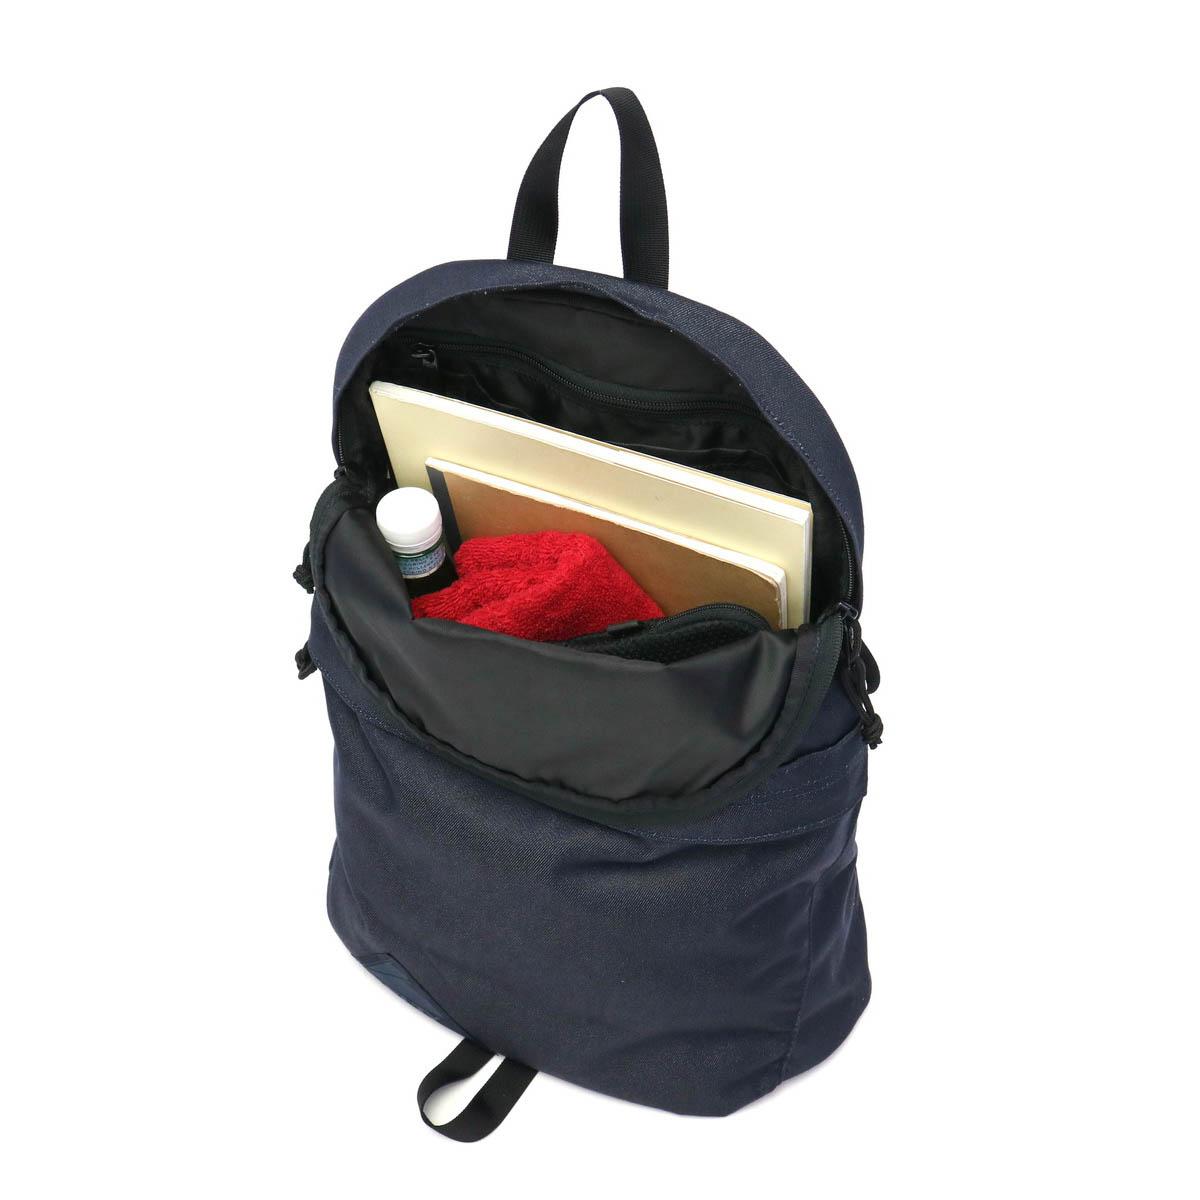 28b8b83c358 Kelty Teardrop Backpack Diaper Bag- Fenix Toulouse Handball